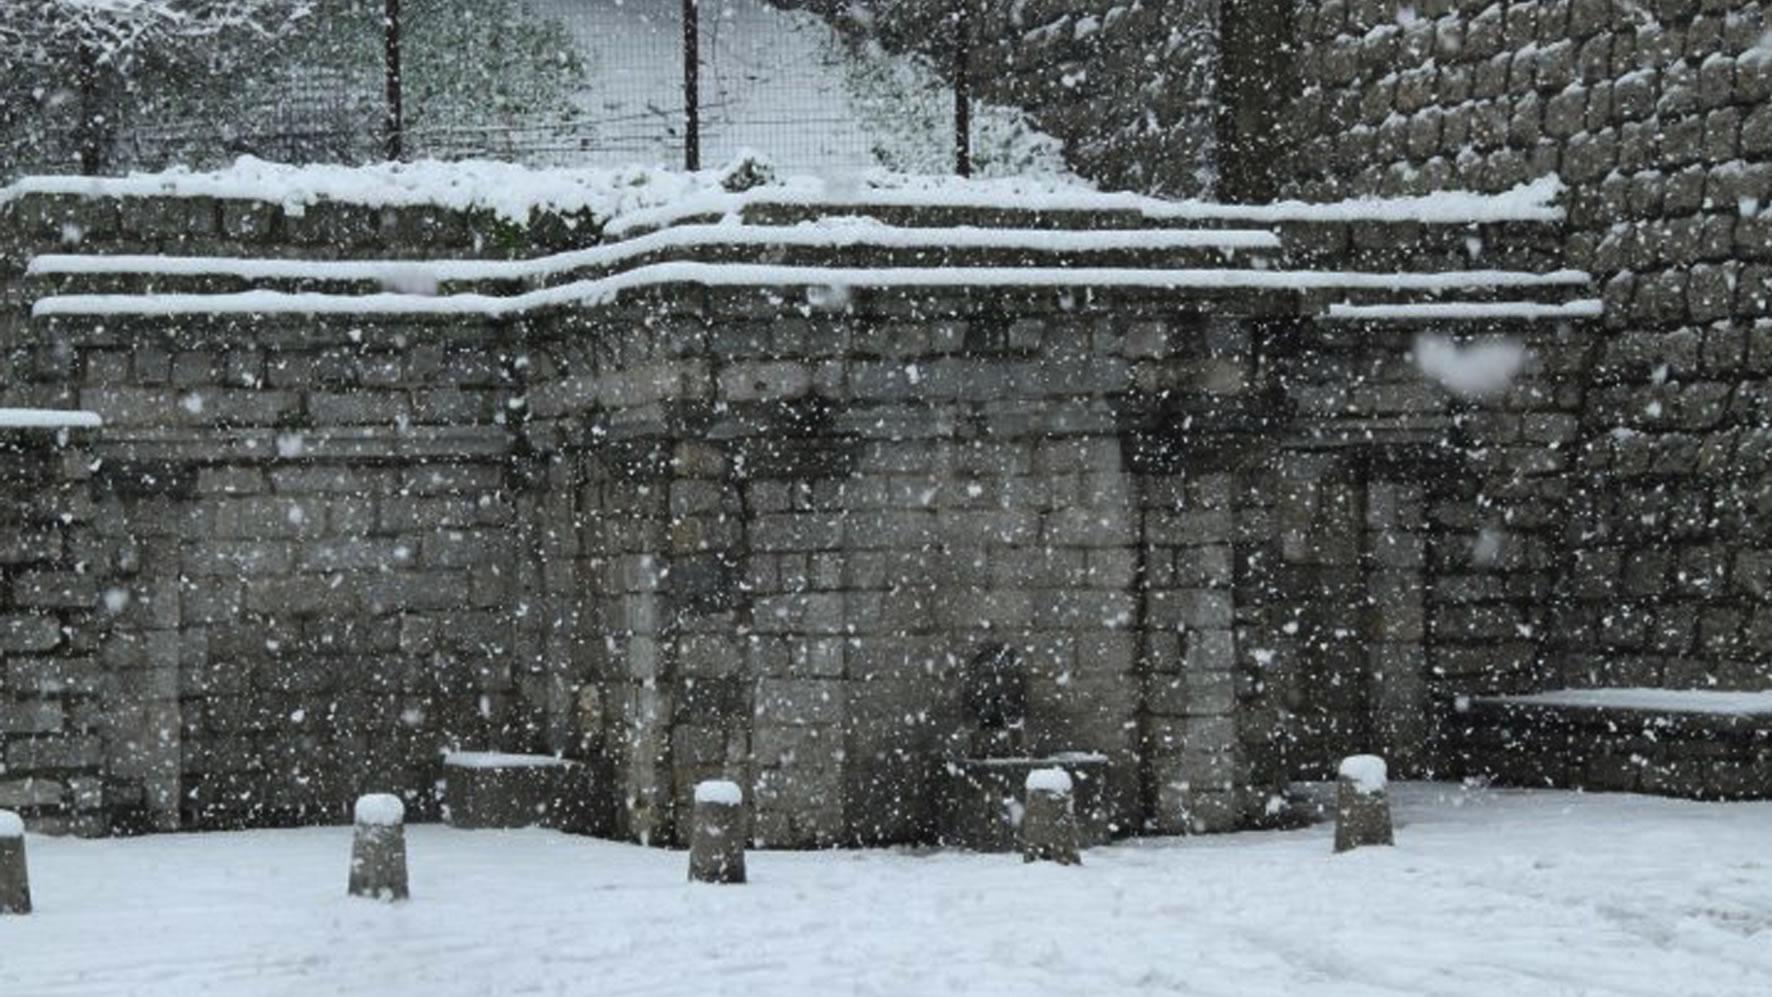 Fontana di Pastini, Tempio Pausania